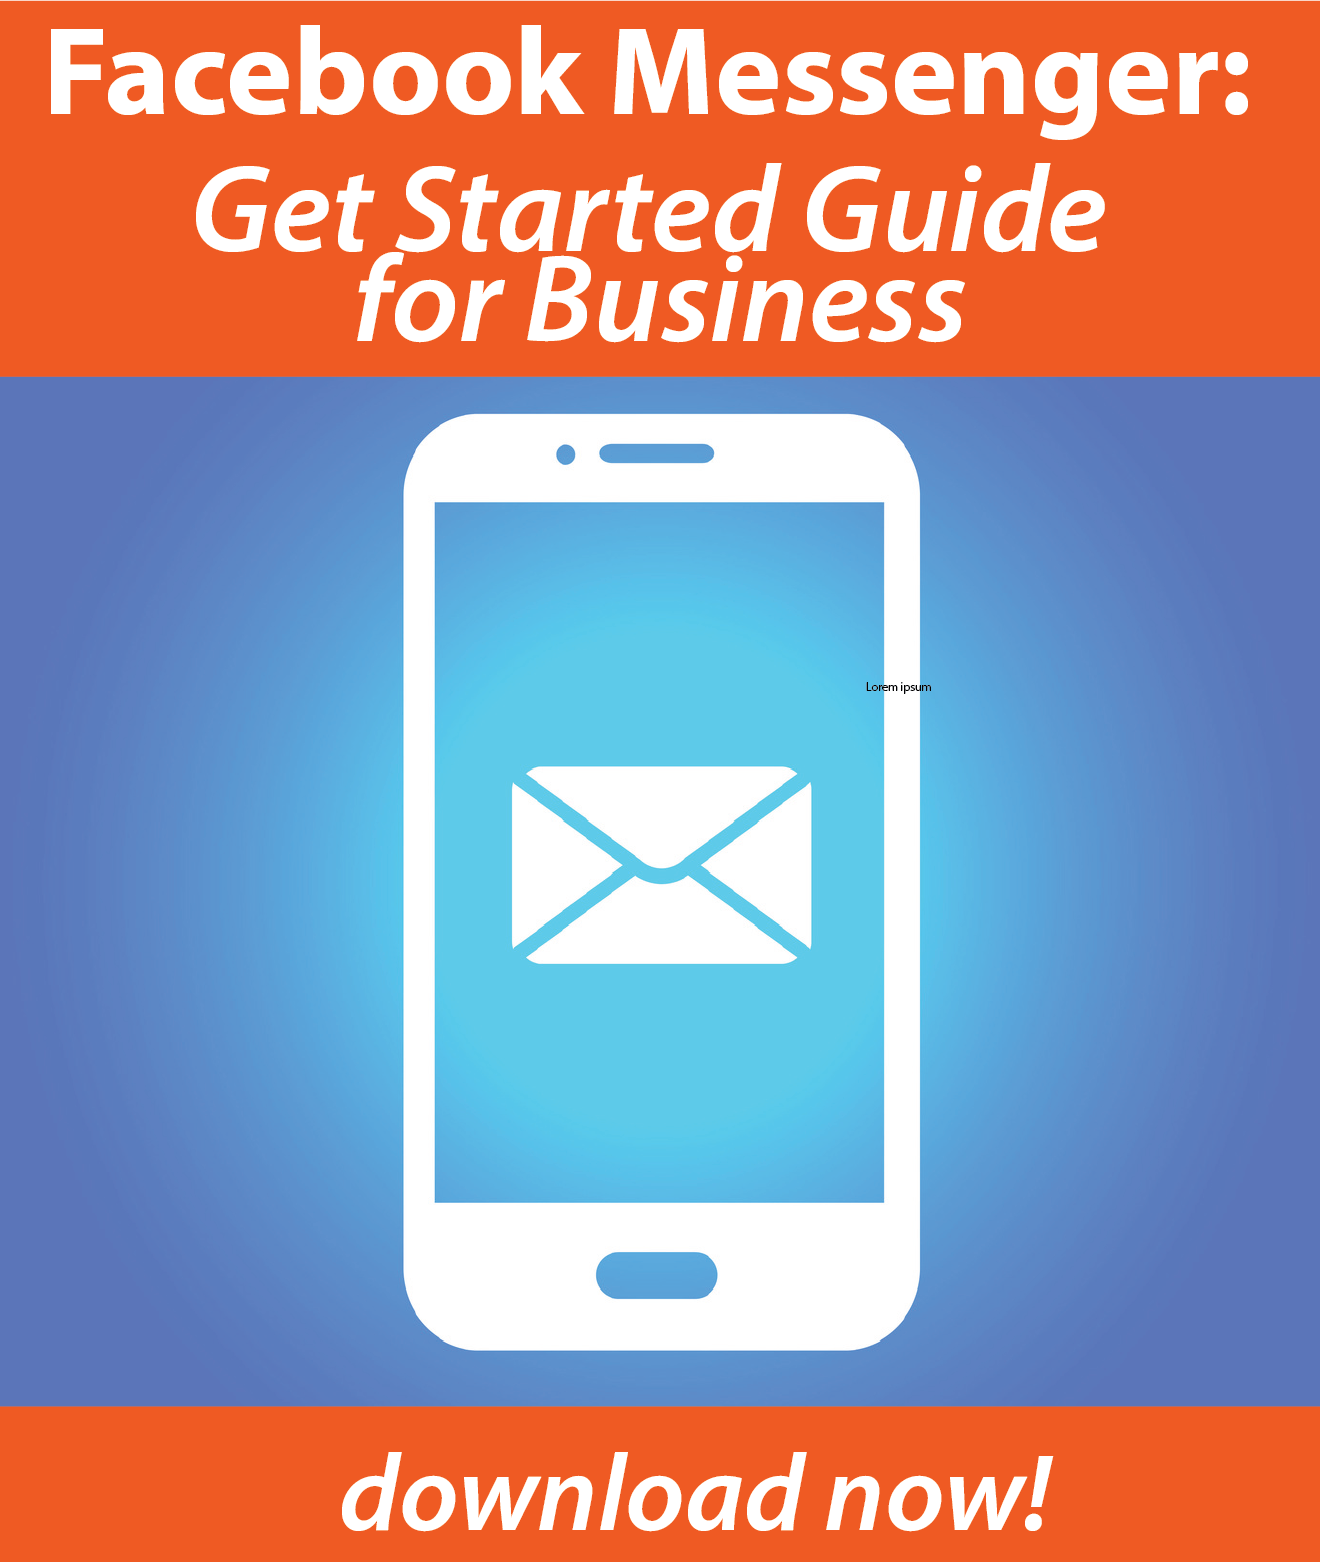 Download Now! Facebook Messenger 101: Get Started Guide for